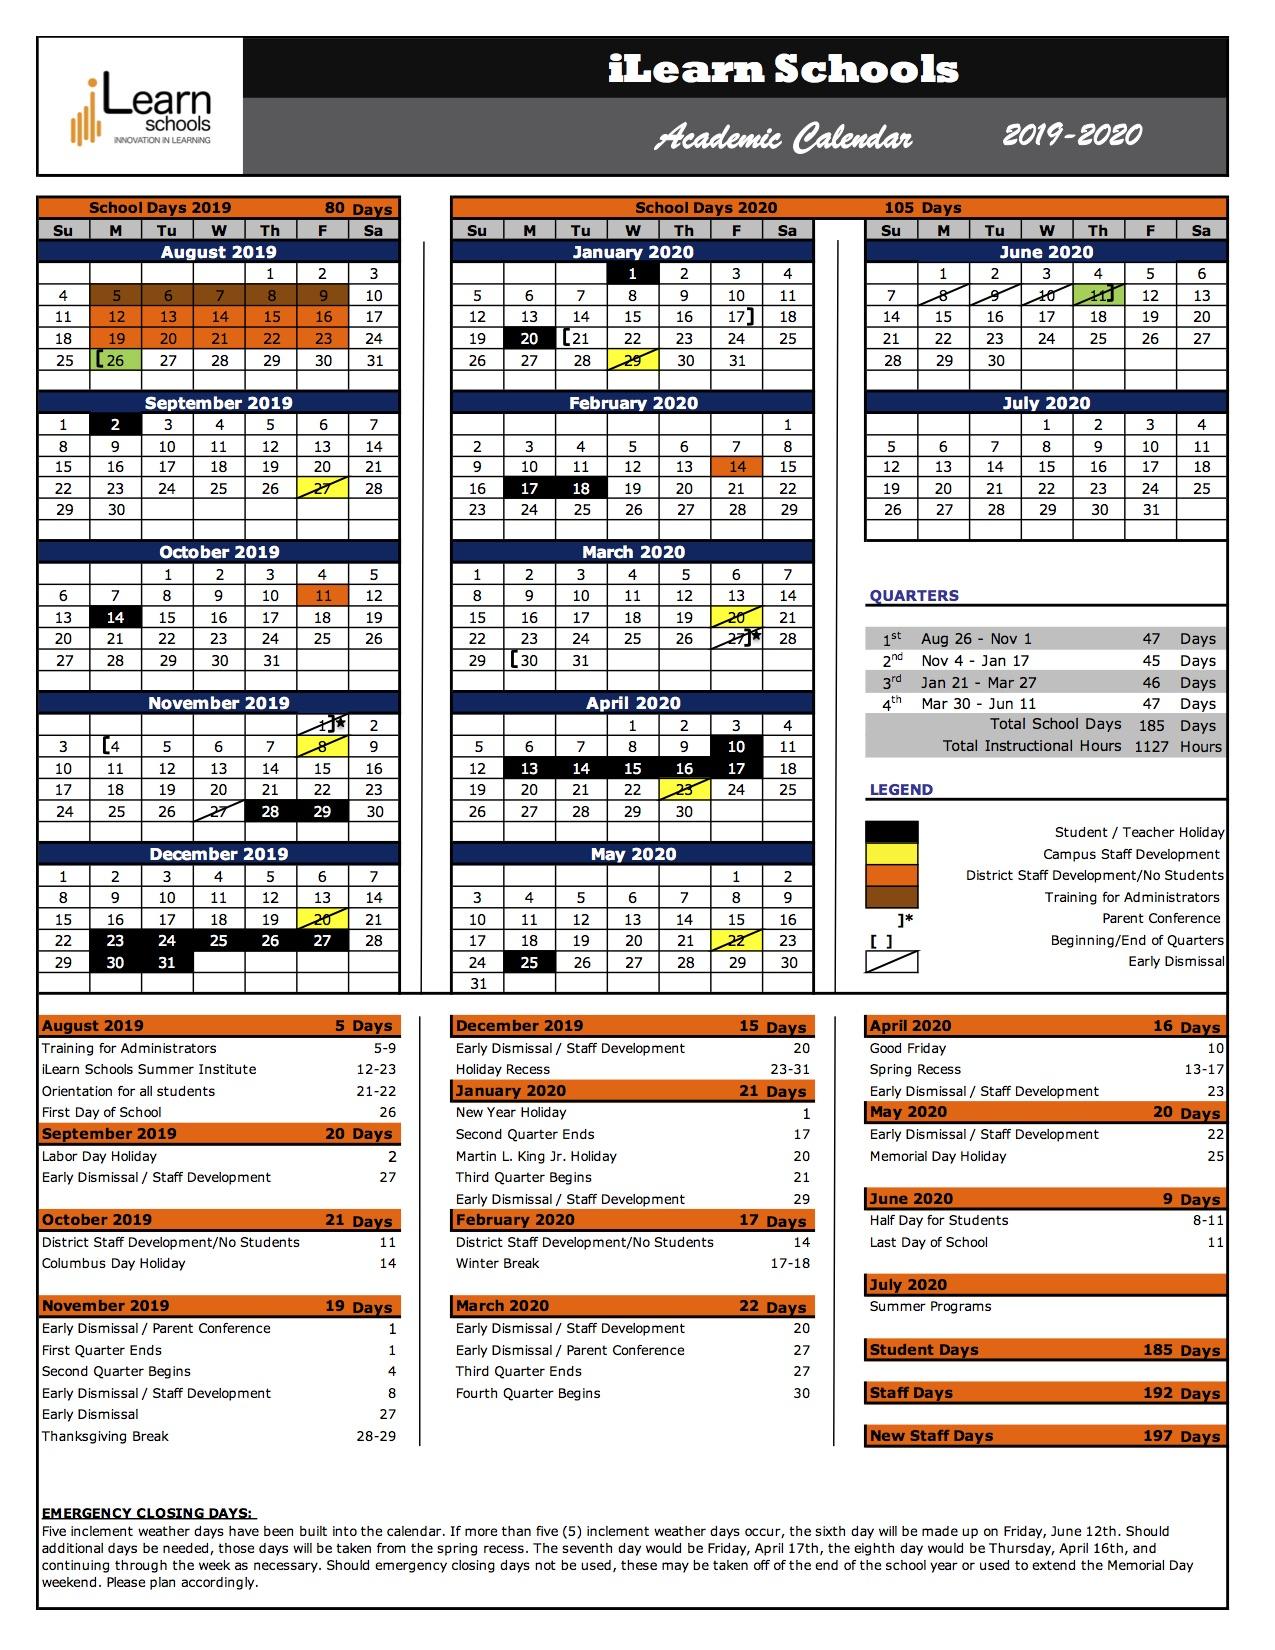 Stony Brook Academic Calendar 2020 iLearn Schools 2019 2020 Academic Calendar | Paterson Arts